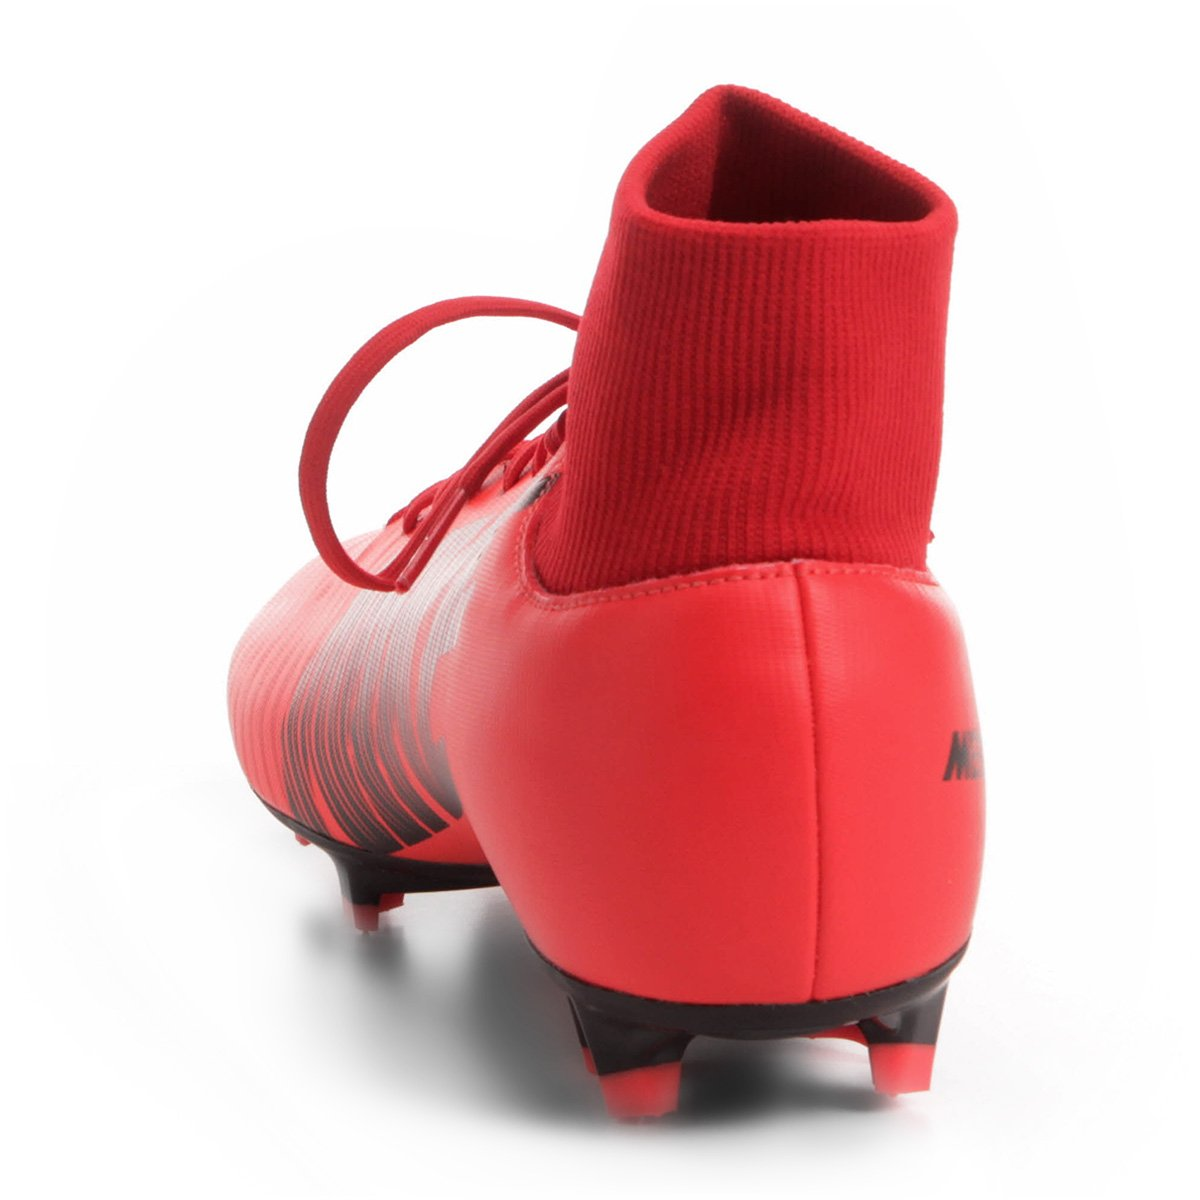 ... Chuteira Campo Nike Mercurial Victory 6 Dynamic Fit FG Masculina ... 3f26a4abe2e4a